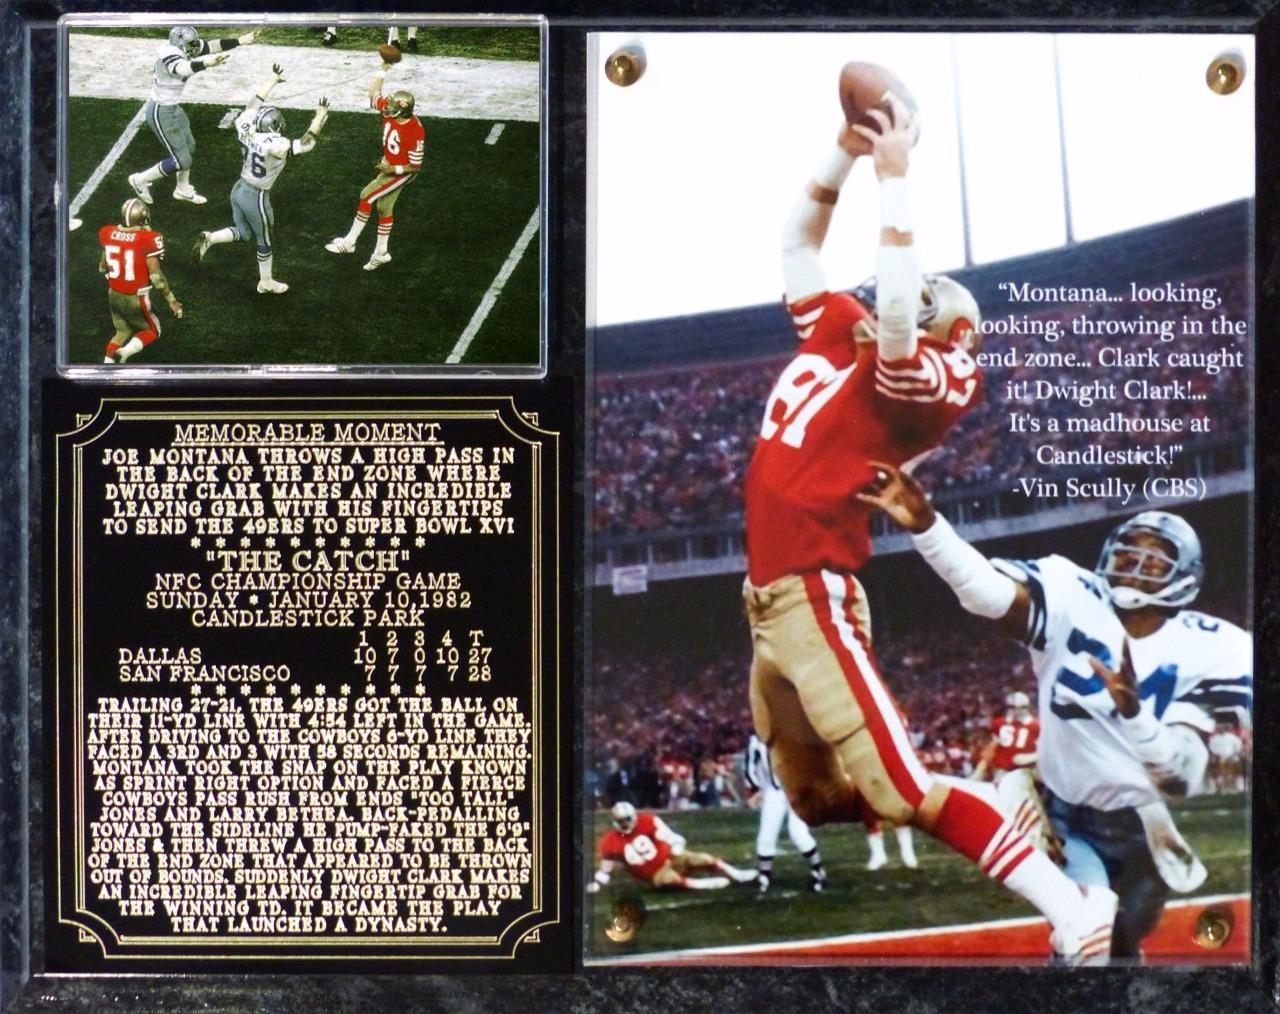 Dwight-Clark-The-Catch-Memorable-Moment-Photo-Plaque-